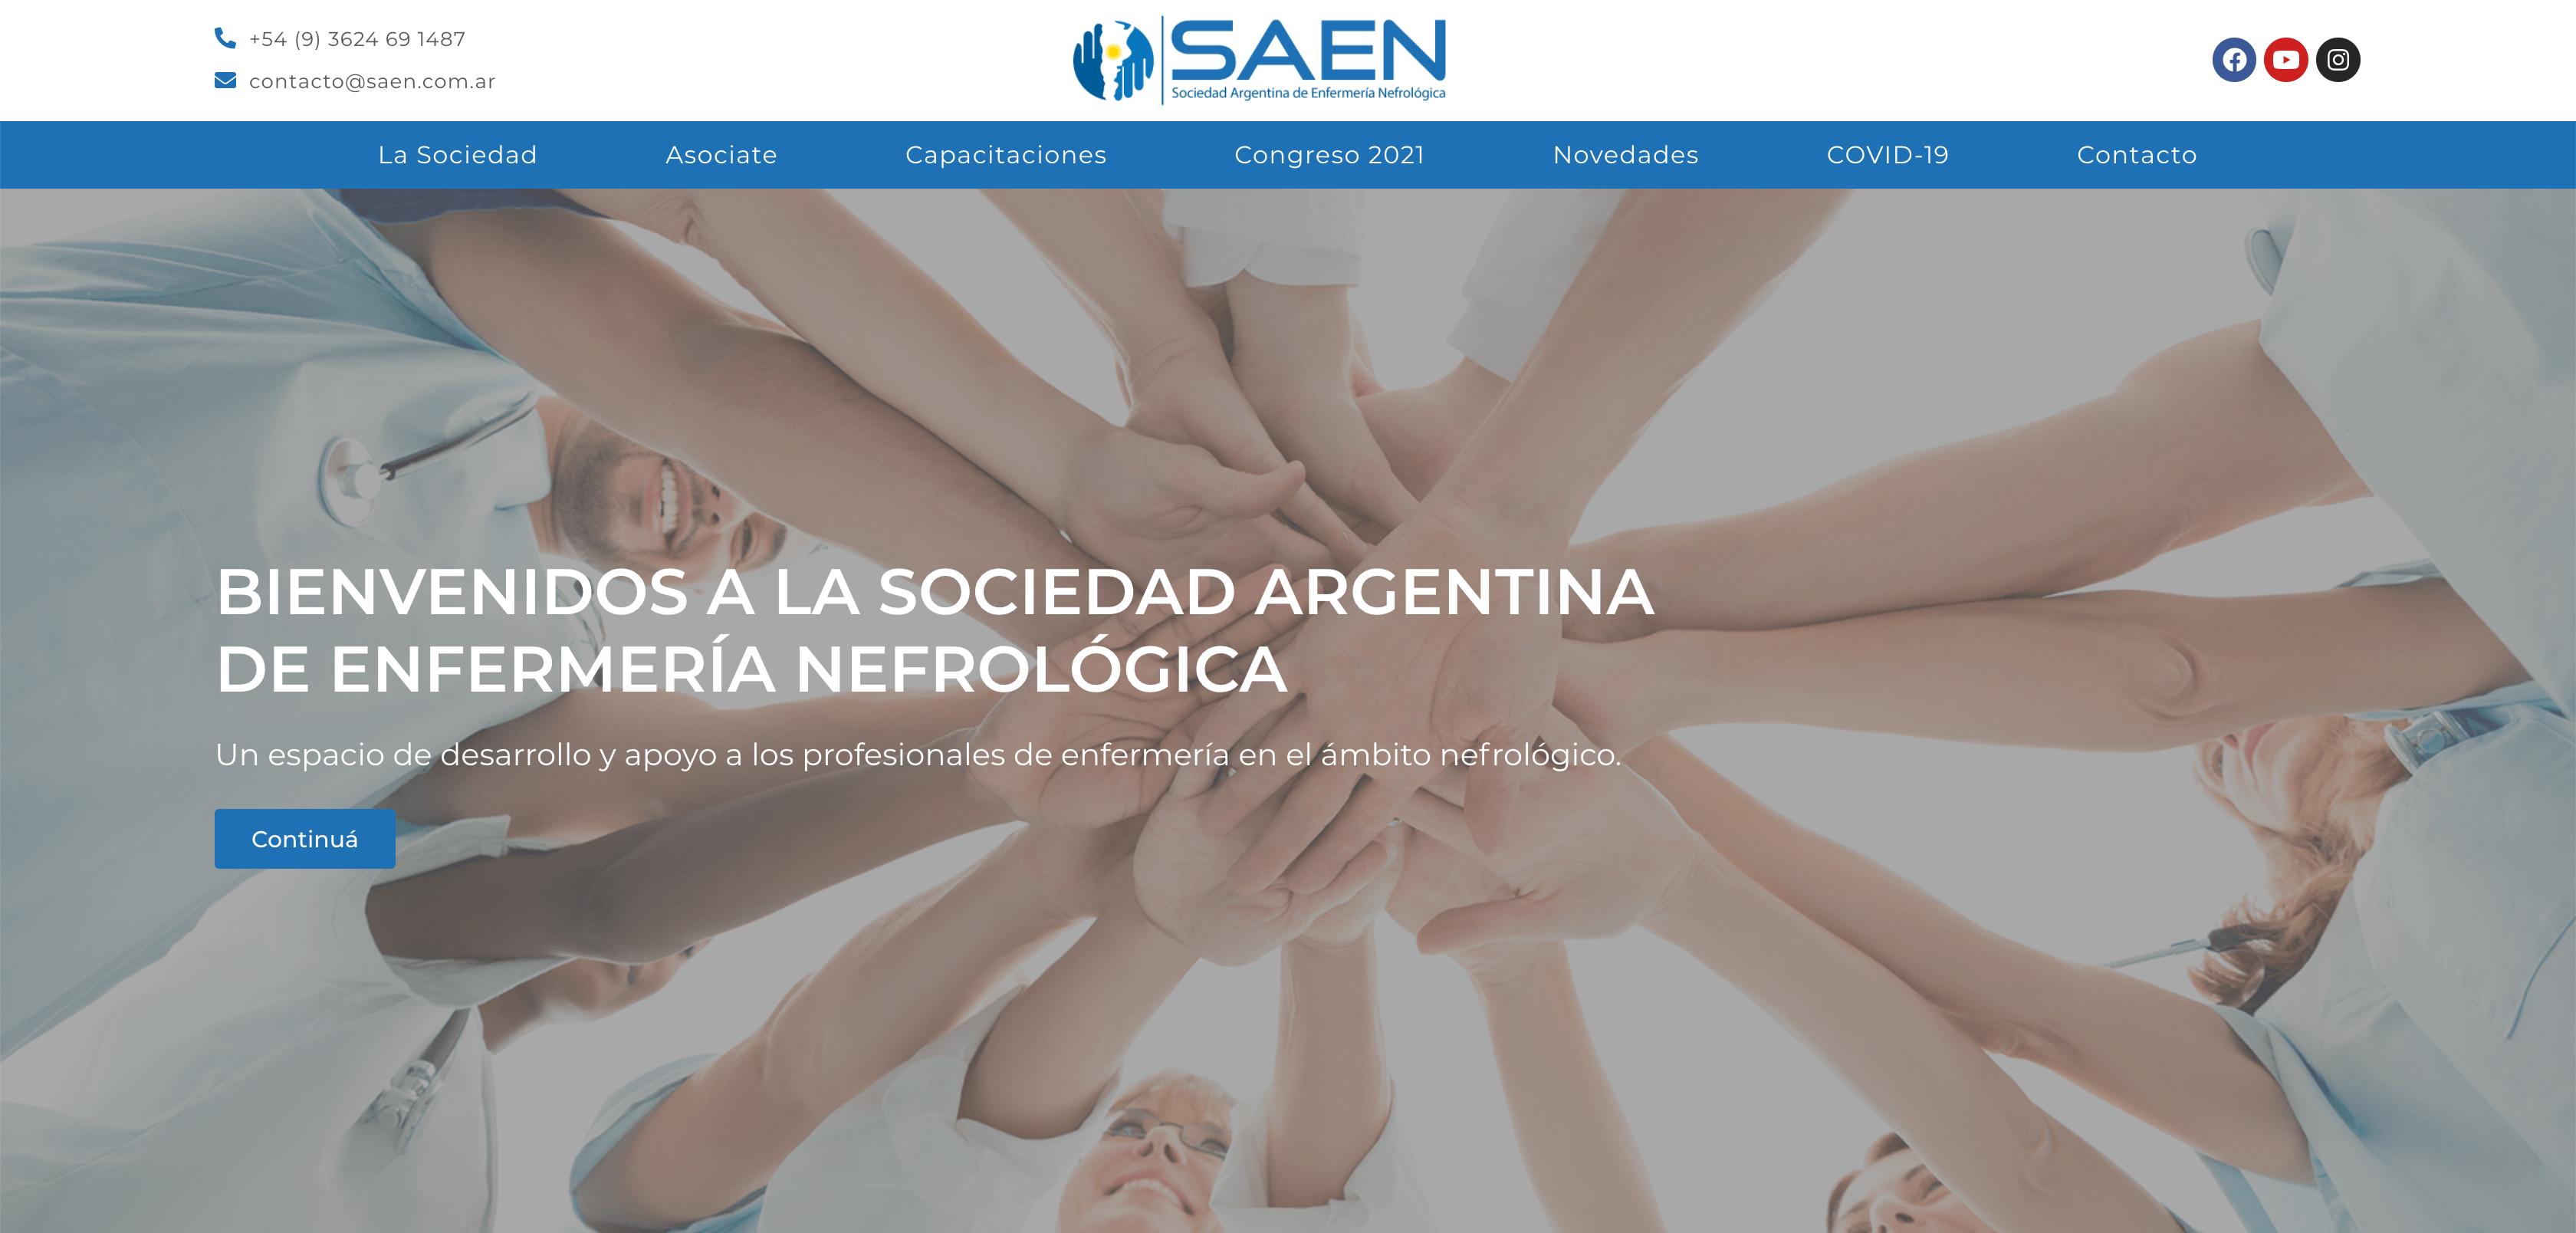 saen-sociedad-argentina-de-enfermeria-nefrologica-online-lab-web-development-web-design-2